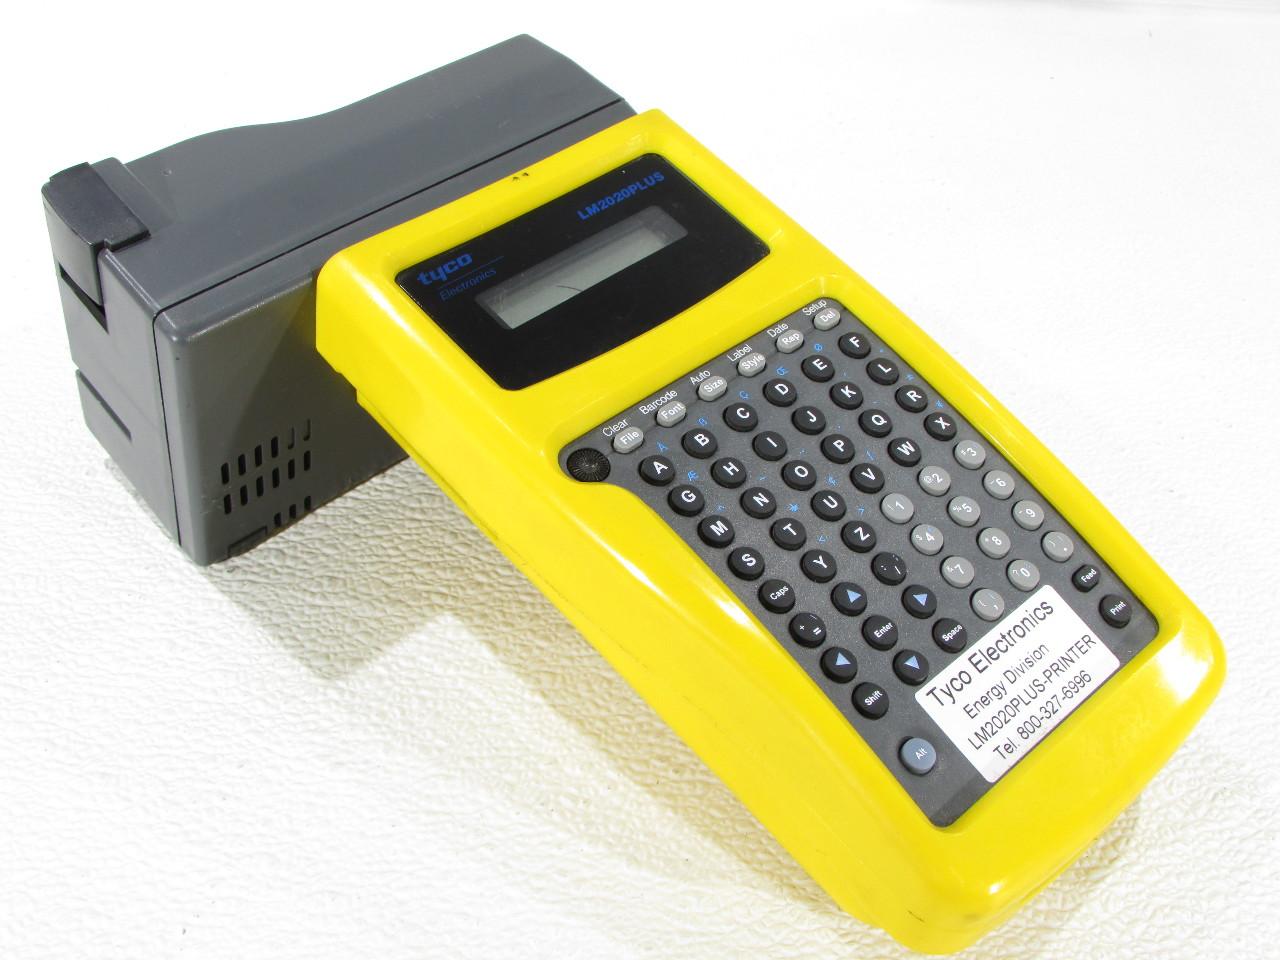 TYCO ELECTRONICS LM2020-PLUS HAND HELD LABEL PRINTER ...